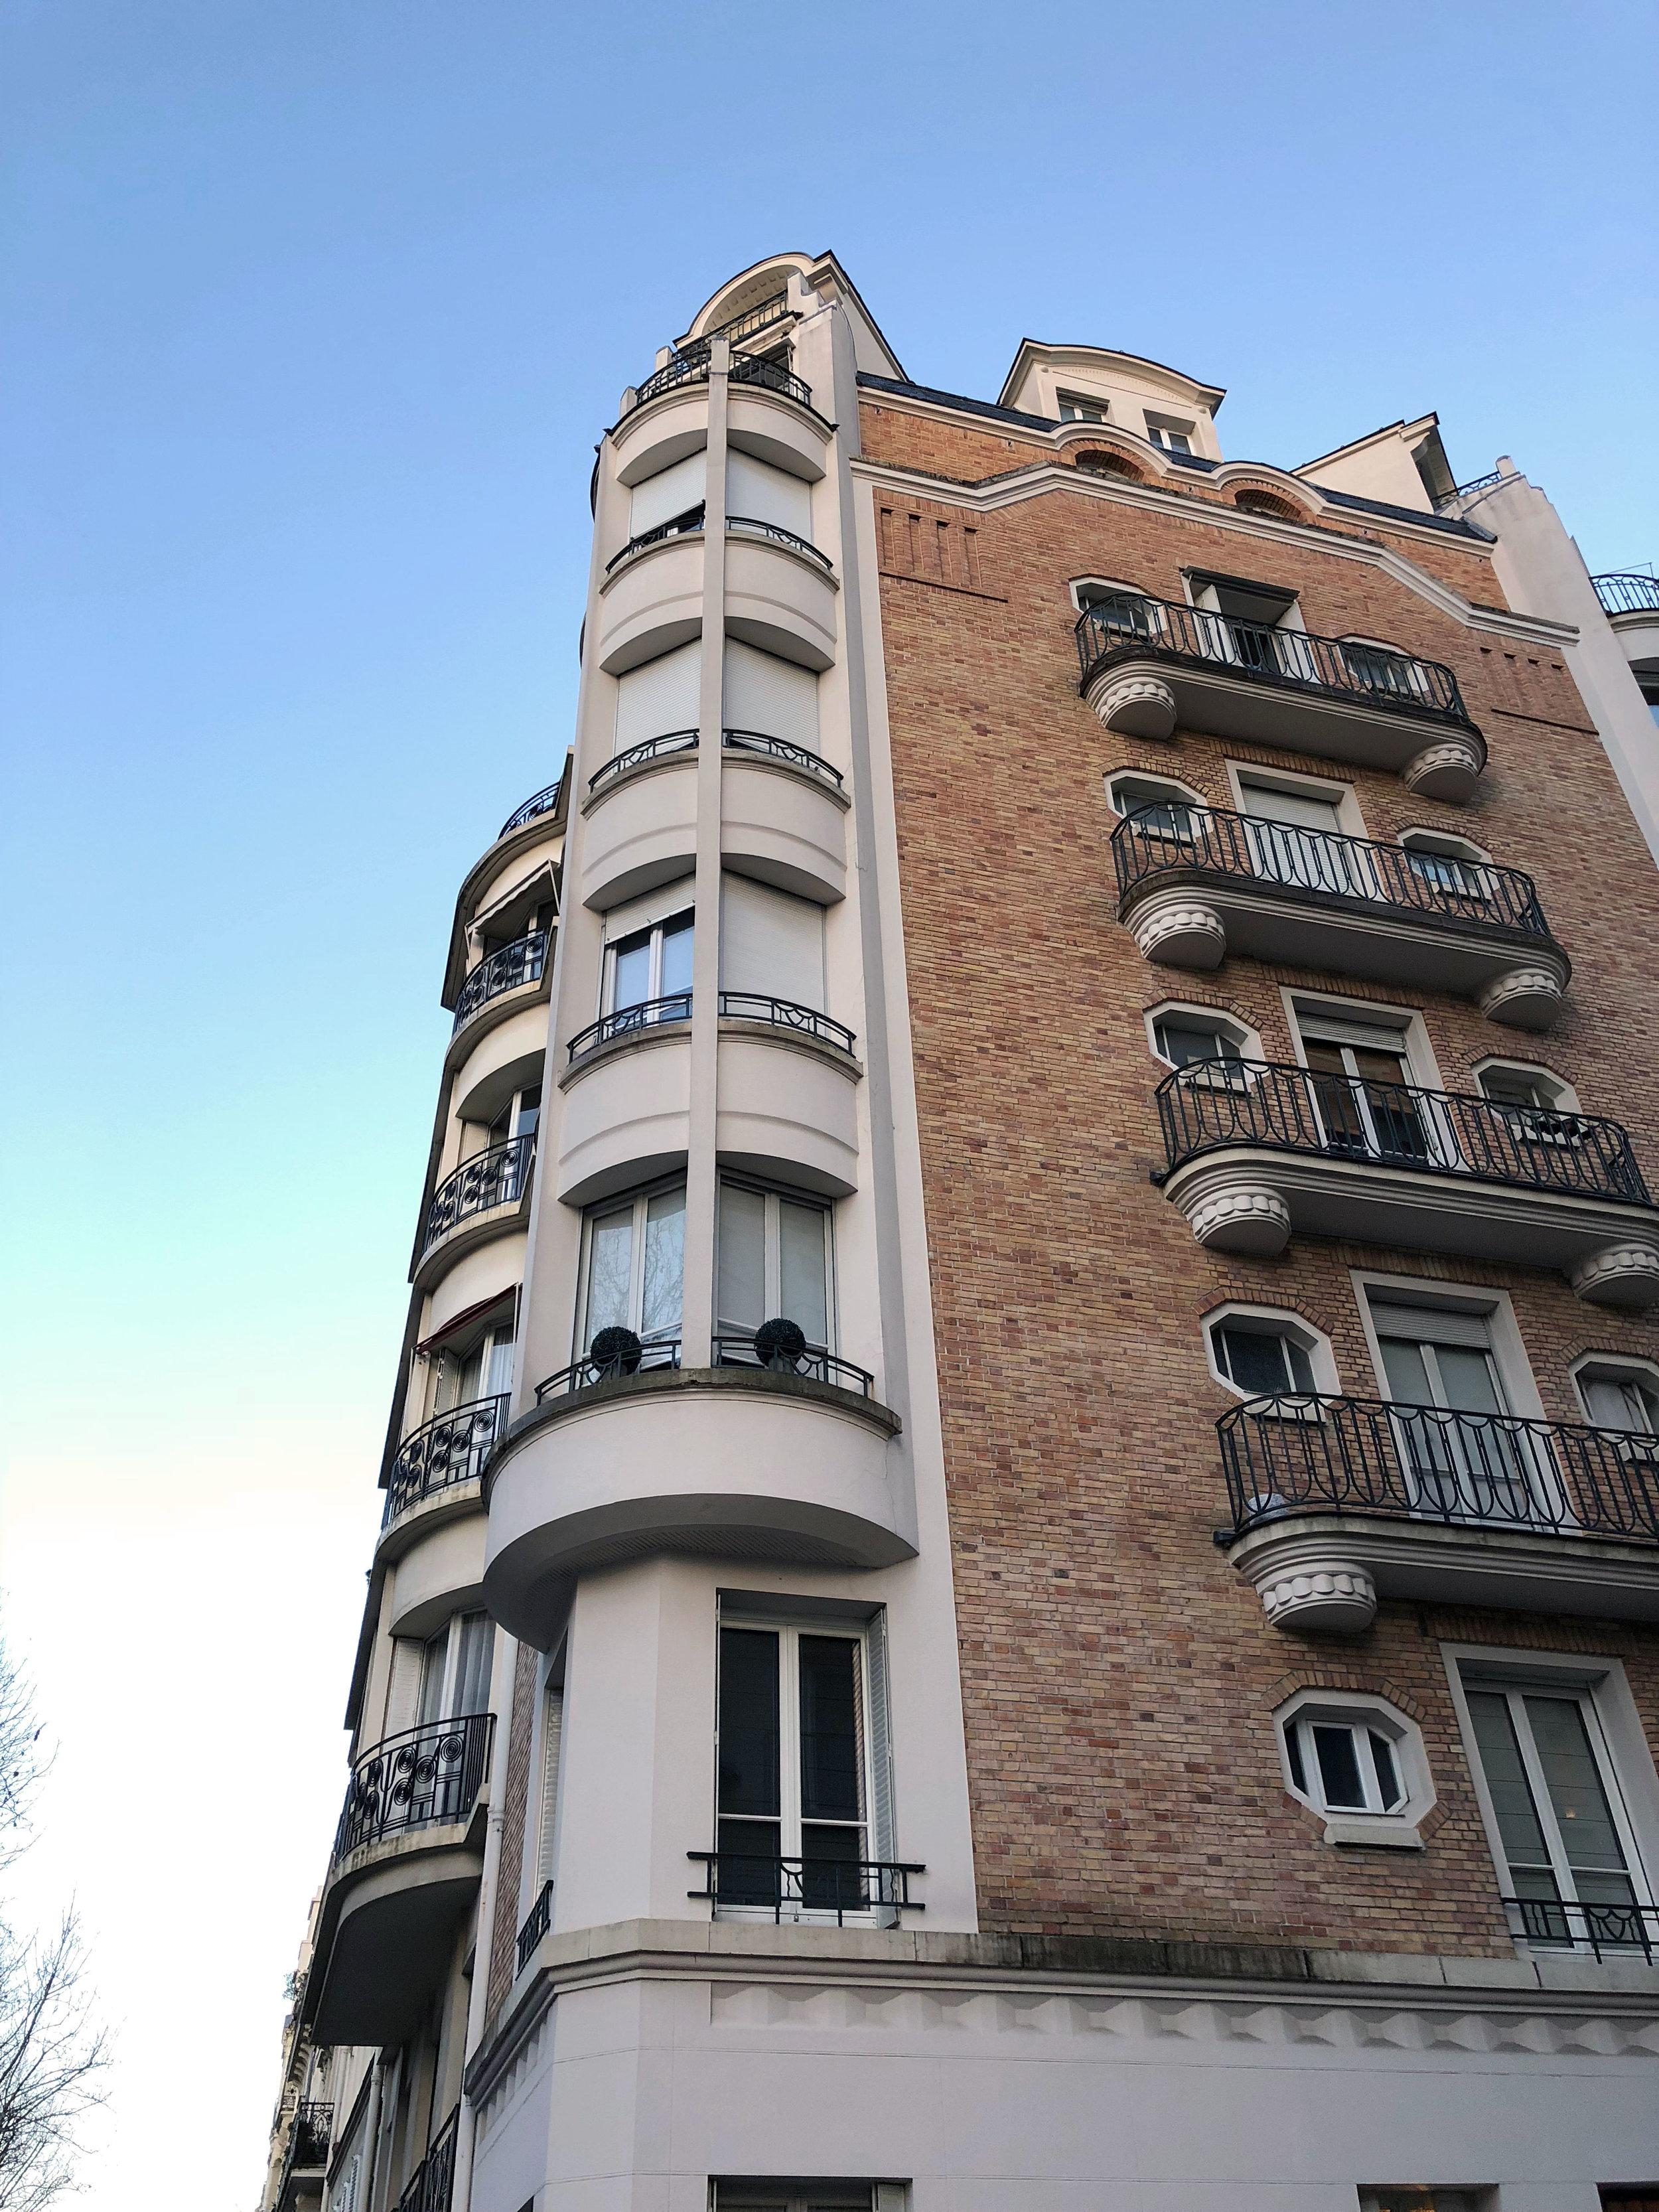 Modern Parisian architecture